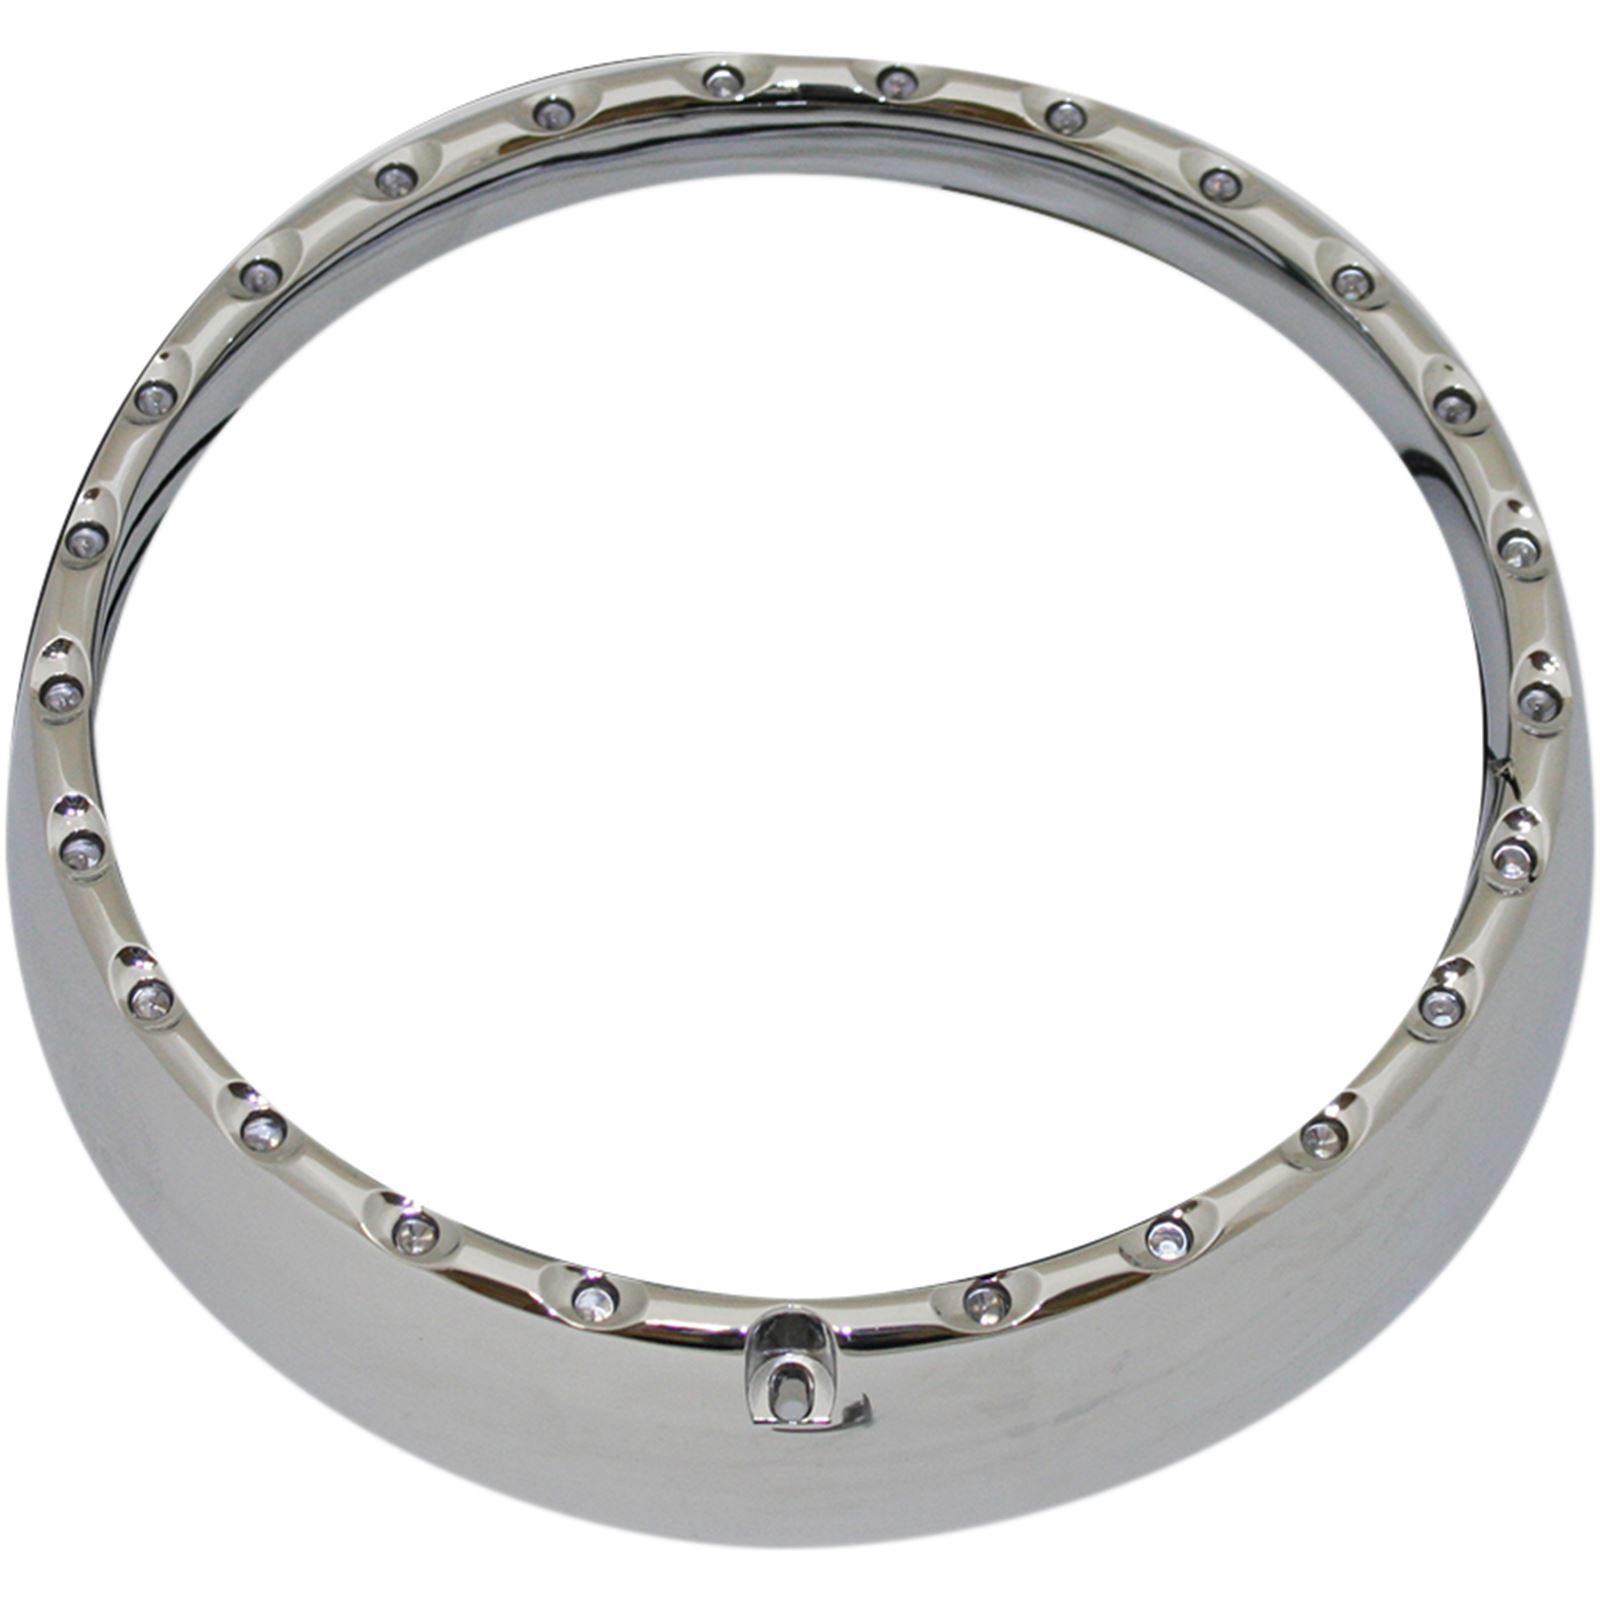 Custom Dynamics Halo Headlight Trim Ring - Chrome